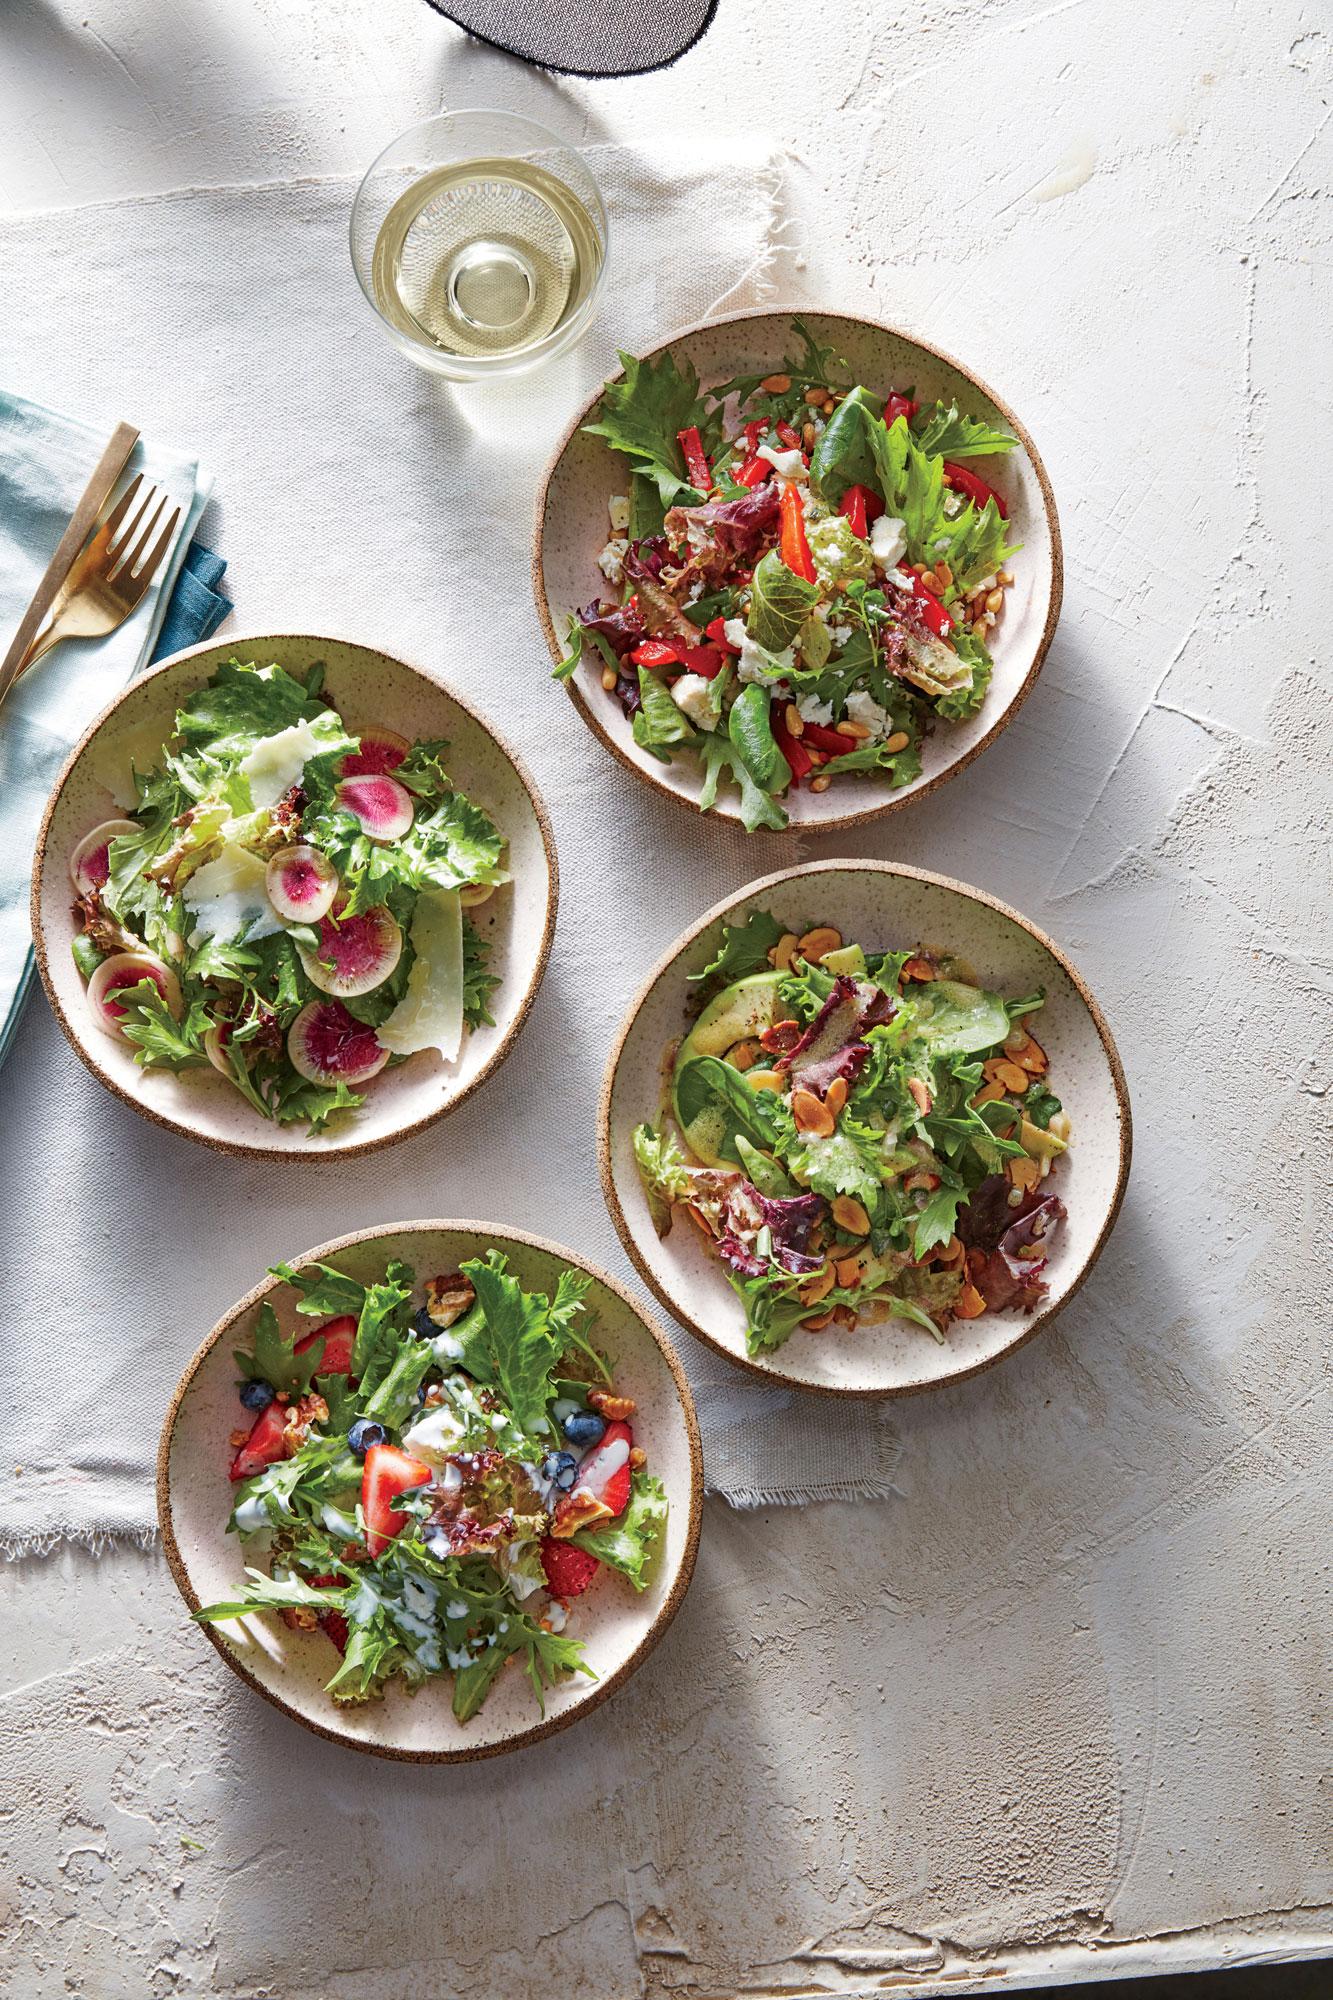 Avocado and Almond Salad